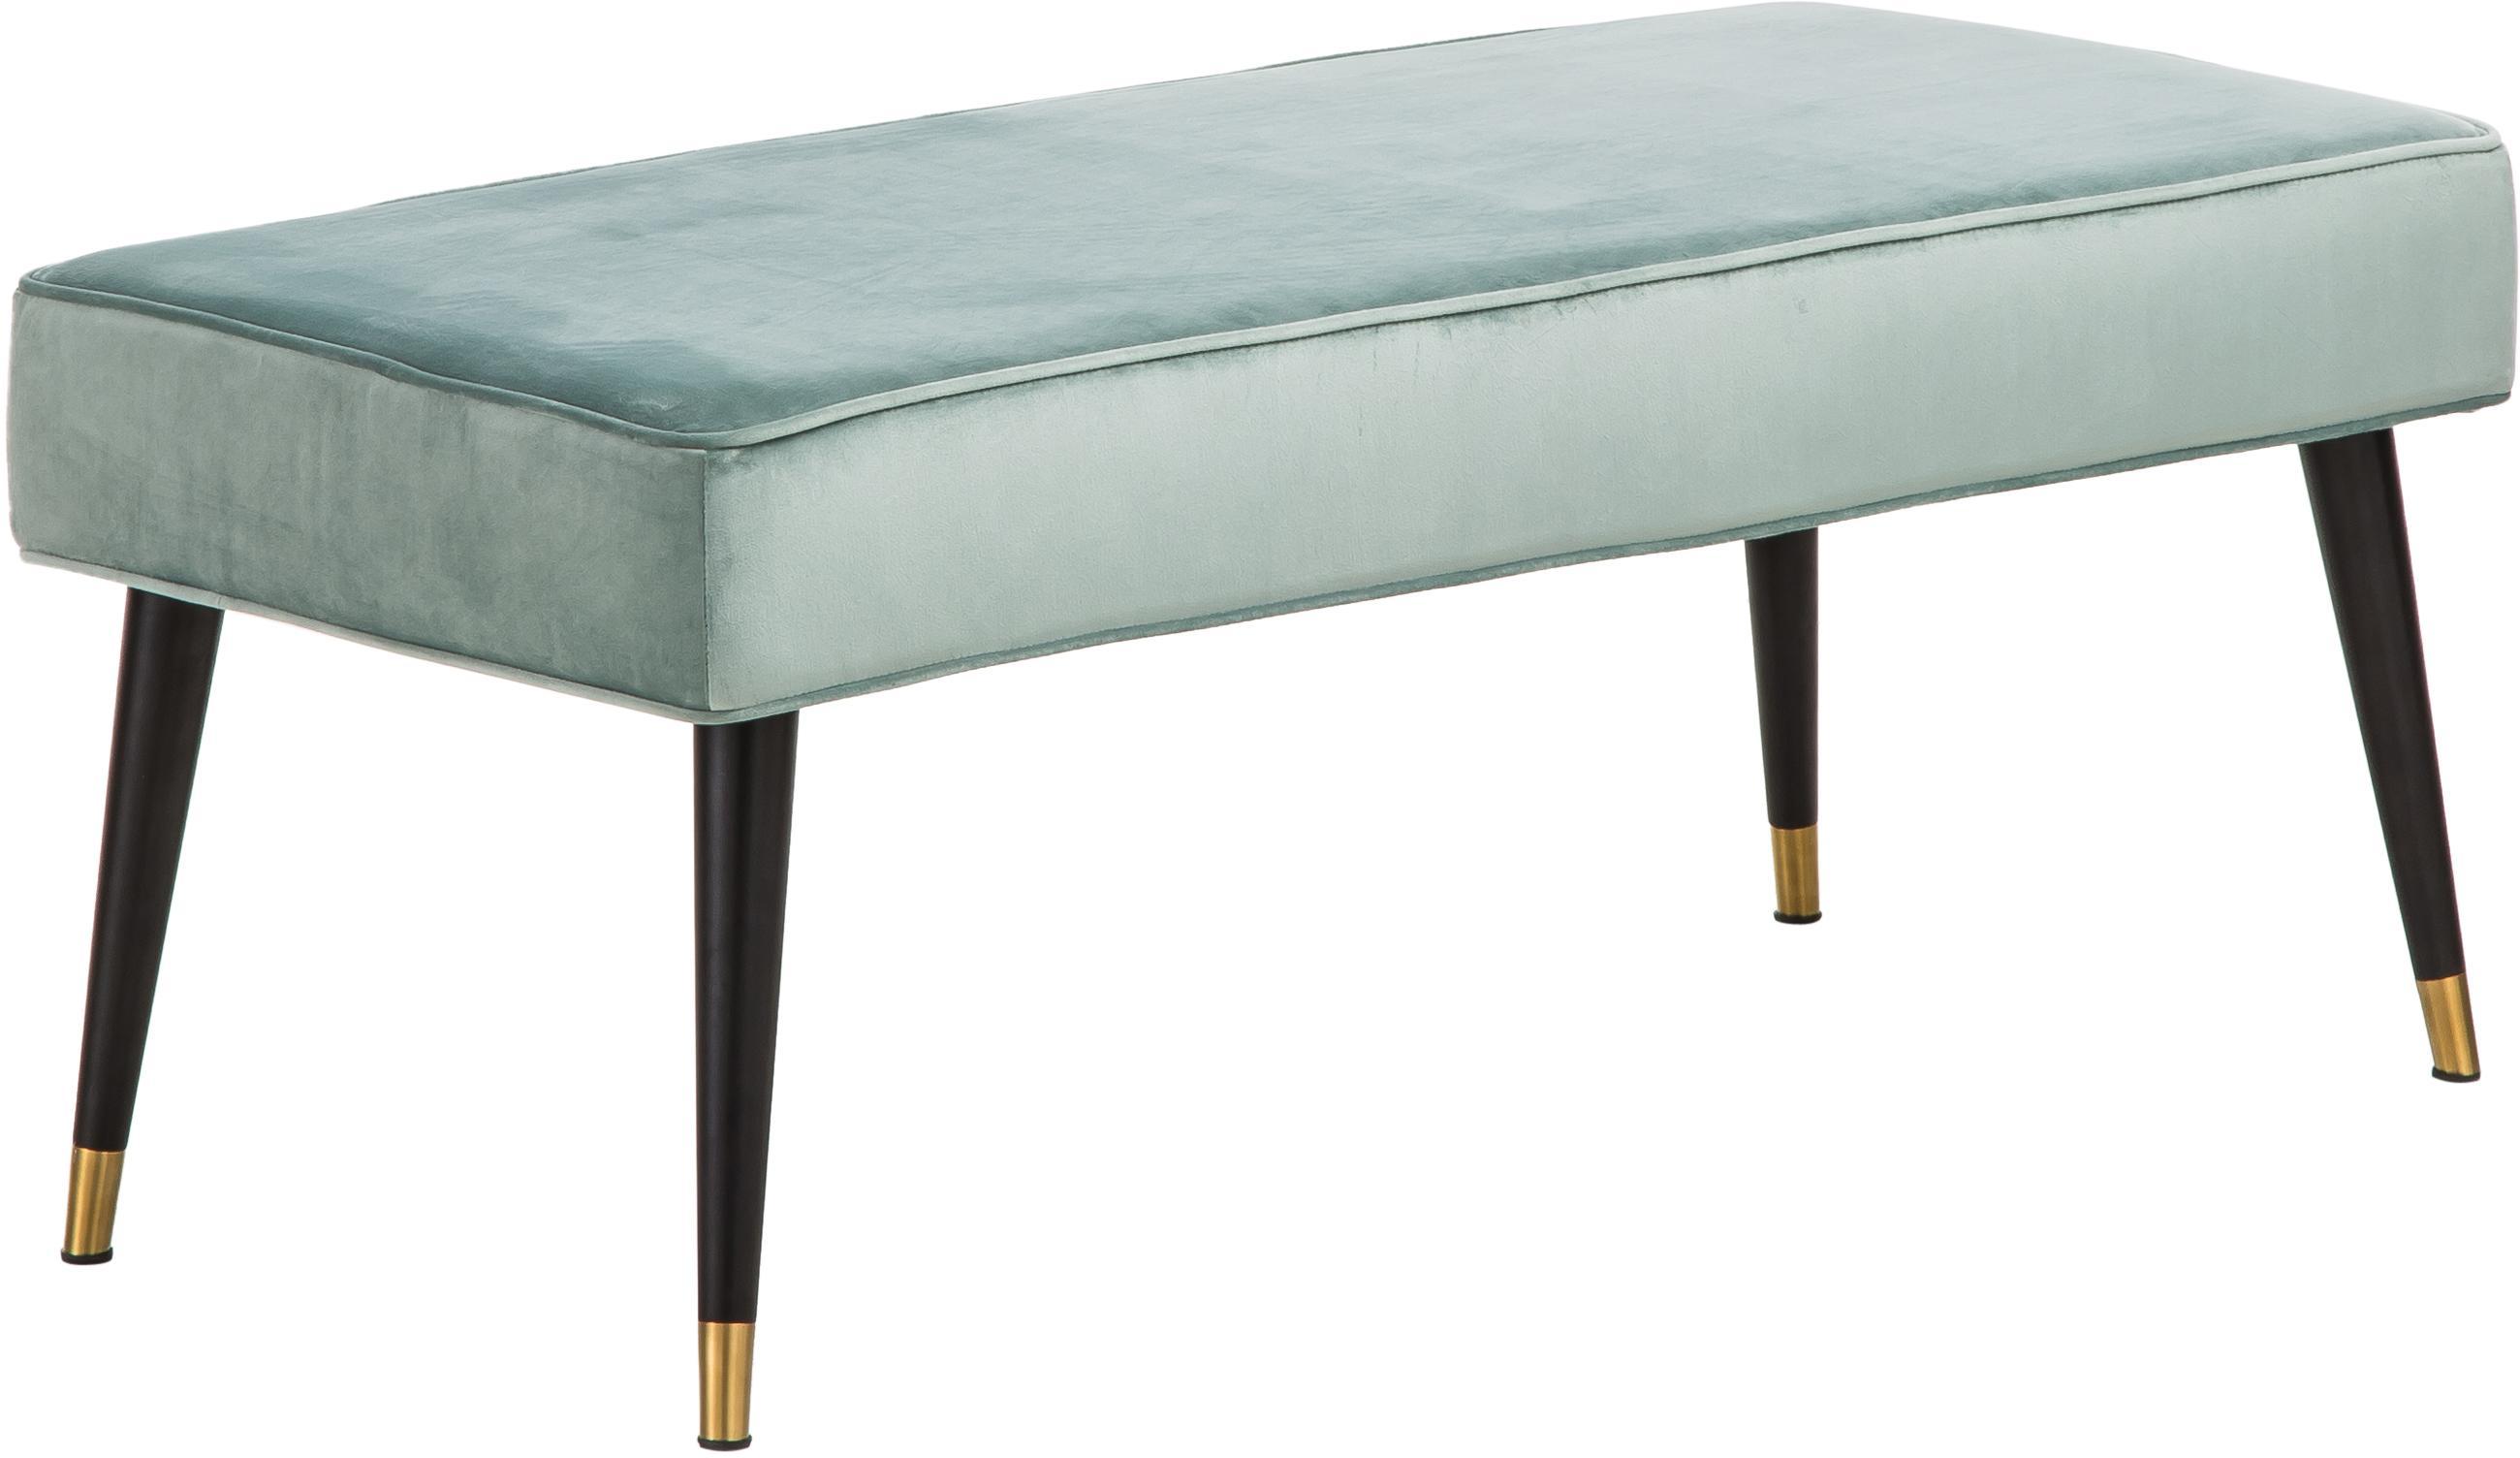 Samt-Sitzbank Beverly, Bezug: Samt (Polyester) 50.000 S, Gestell: Eukalyptusholz, Beine: Metall, pulverbeschichtet, Türkis, 110 x 46 cm